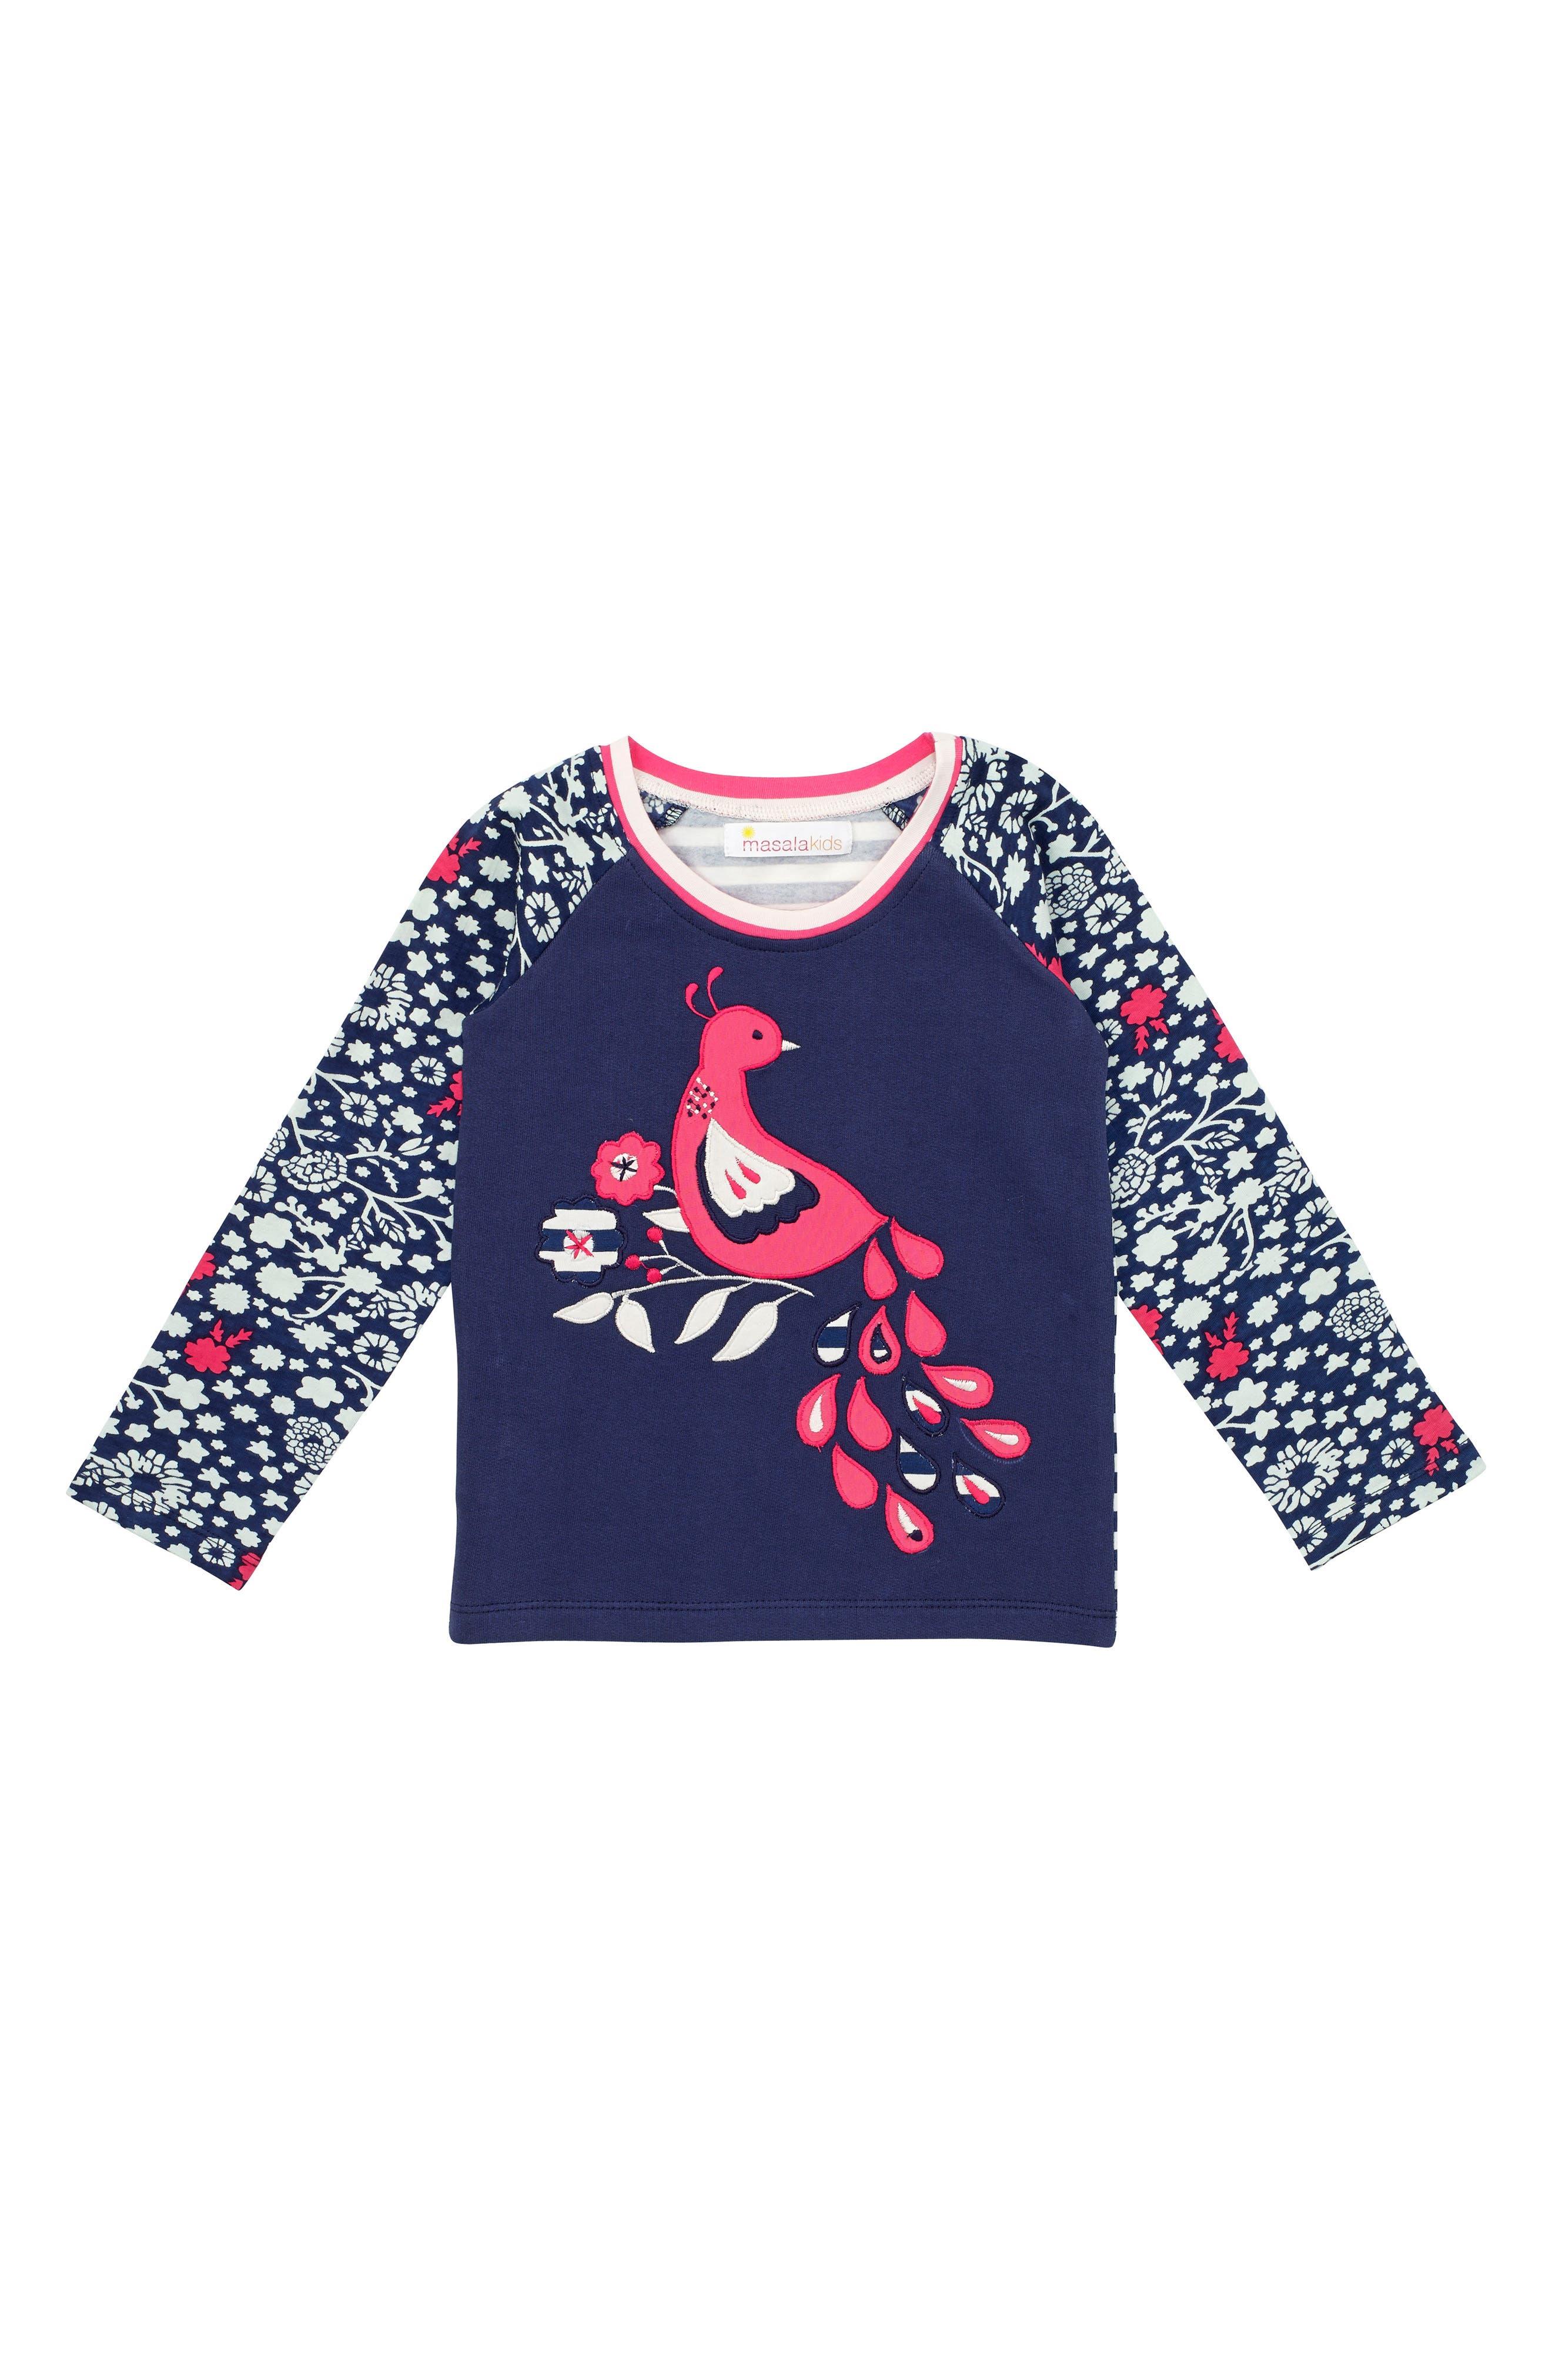 Masalababy Dancing Peacock Appliqué Top (Toddler Girls, Little Girls & Big Girls)